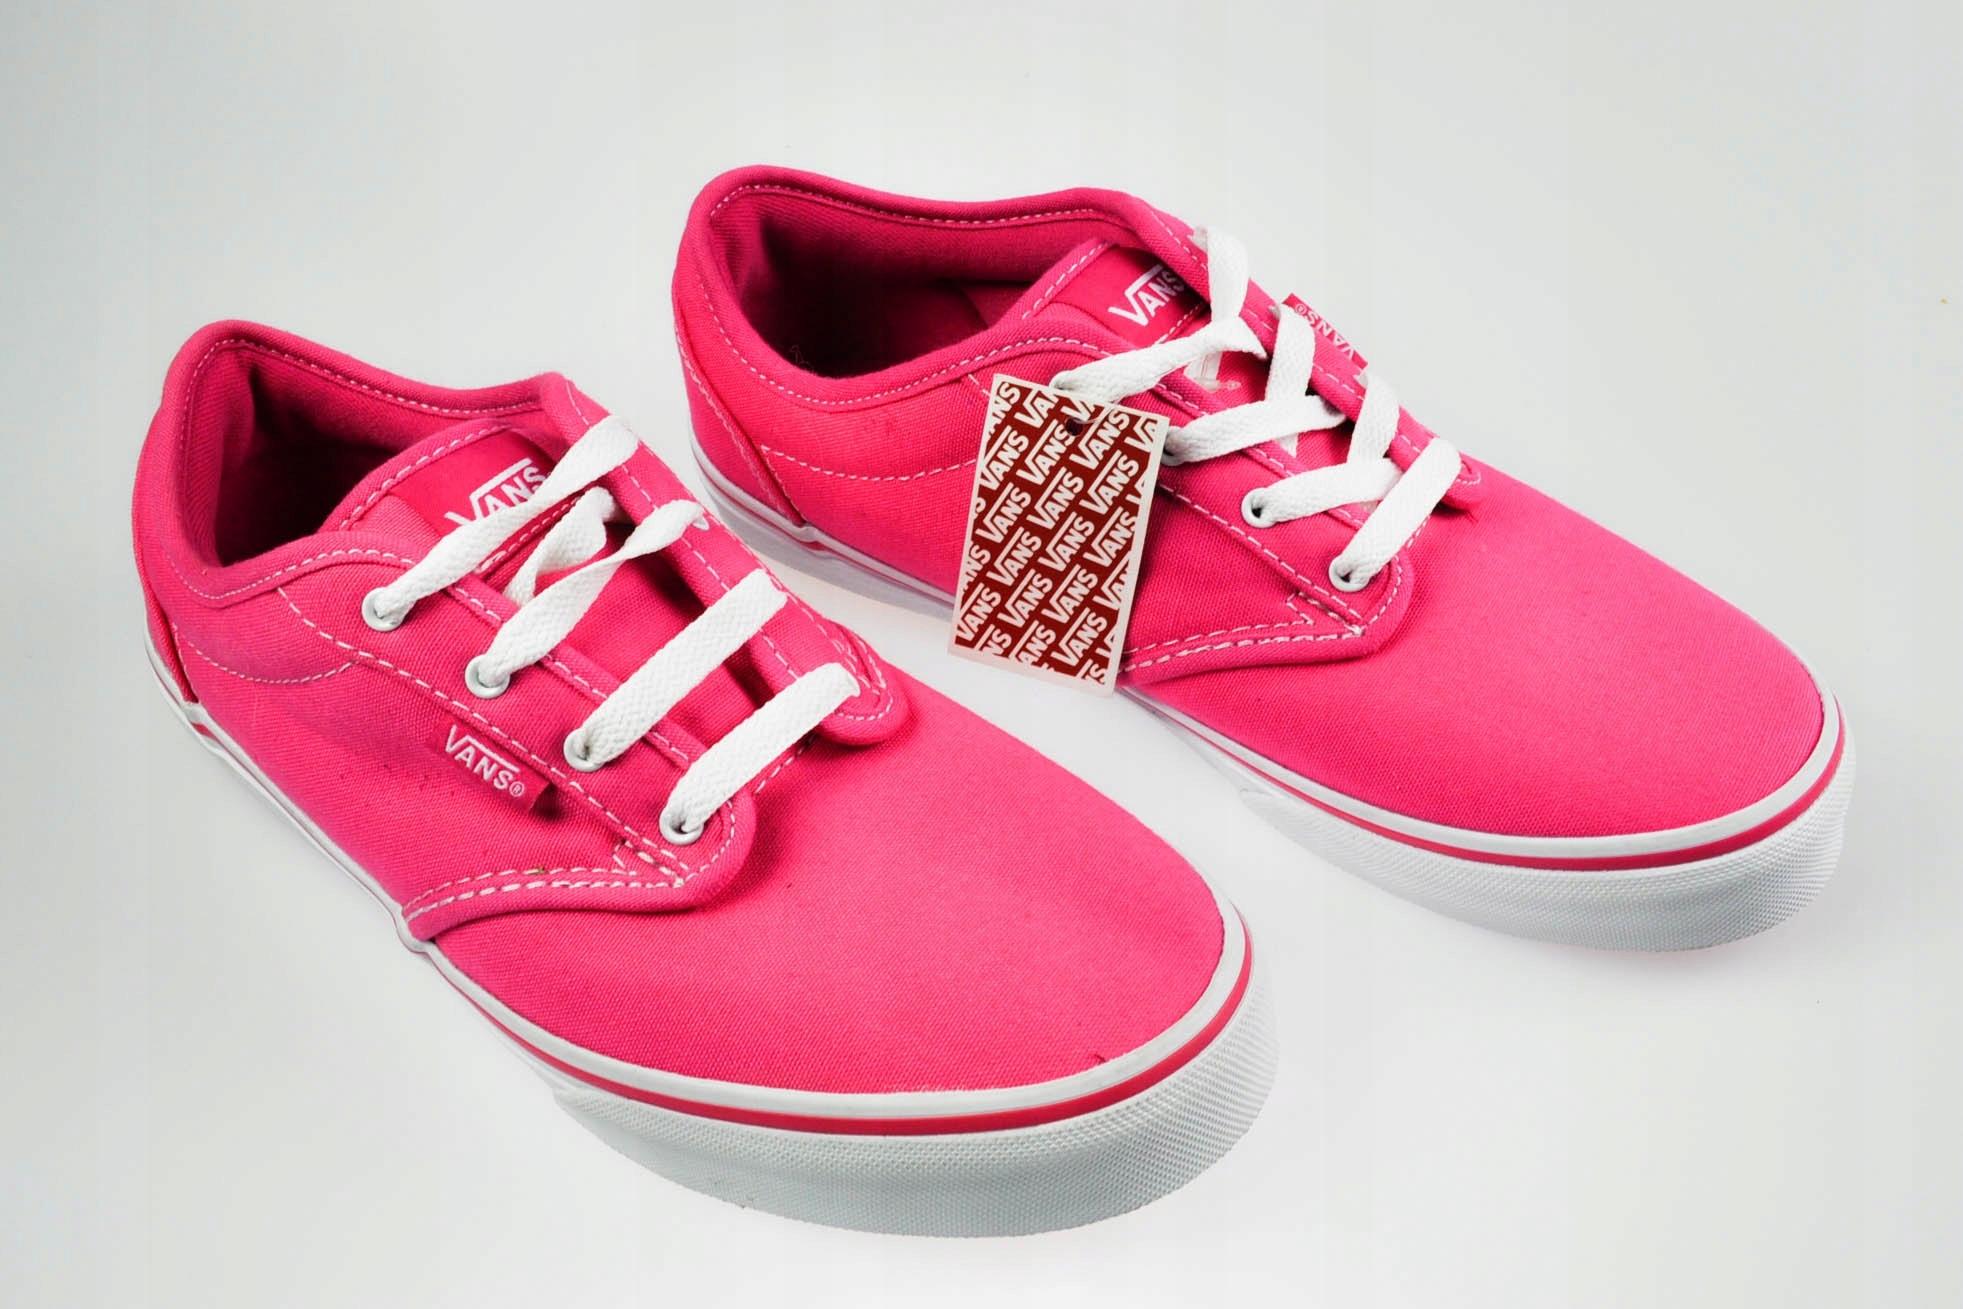 2c936a6b91eae Vans AUTHENTIC Sneakersy niskie r.38 !Wyprzedaż! - 7520062271 ...